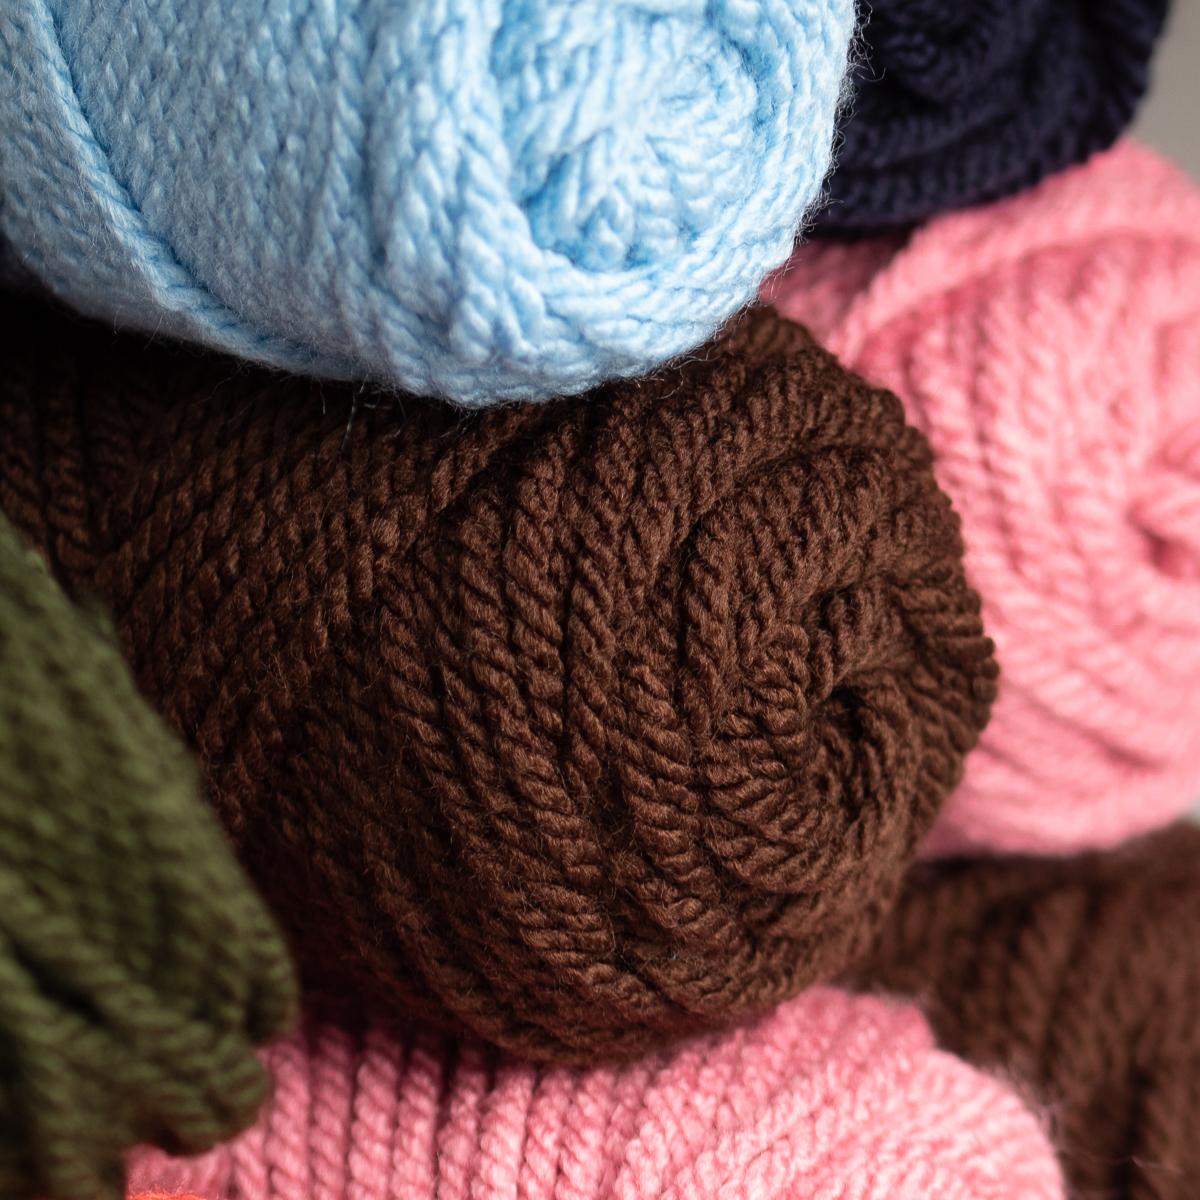 3pk Mary Maxim Titan 100/% Acrylic Yarn #5 Bulky Knitting Crocheting Skeins Soft